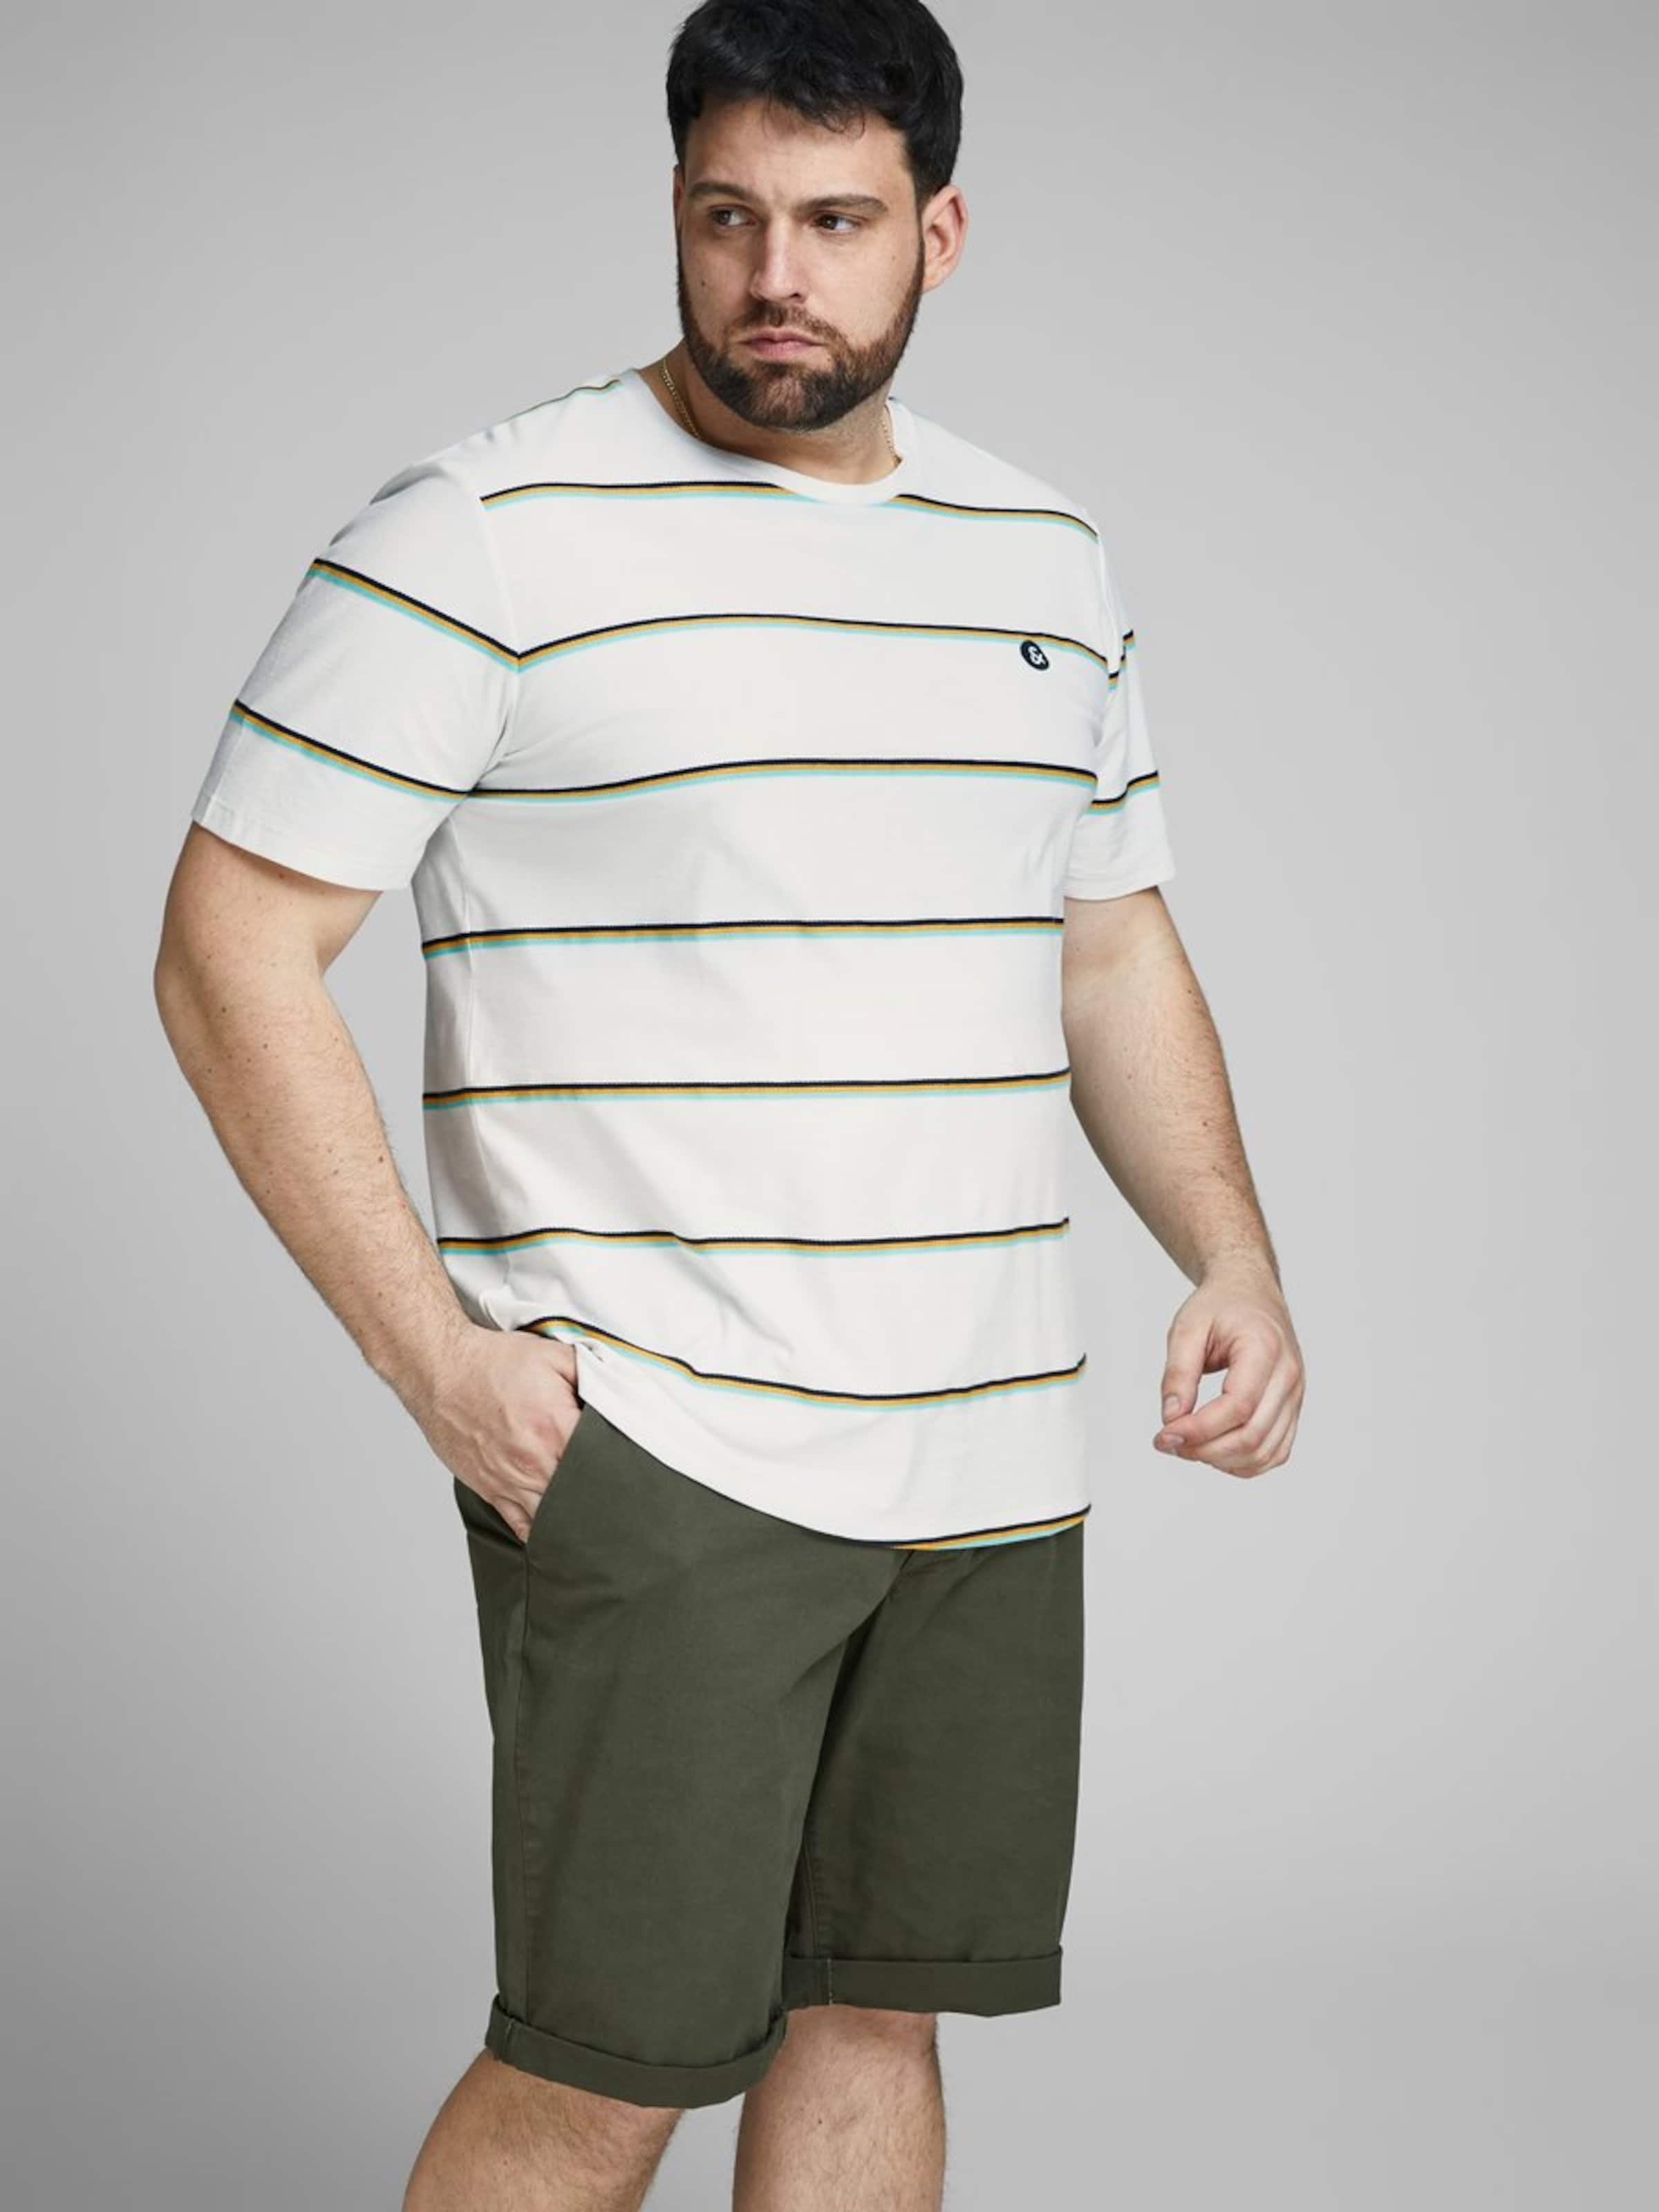 shirt En Blanc Jackamp; T Jones nwyNv0m8O